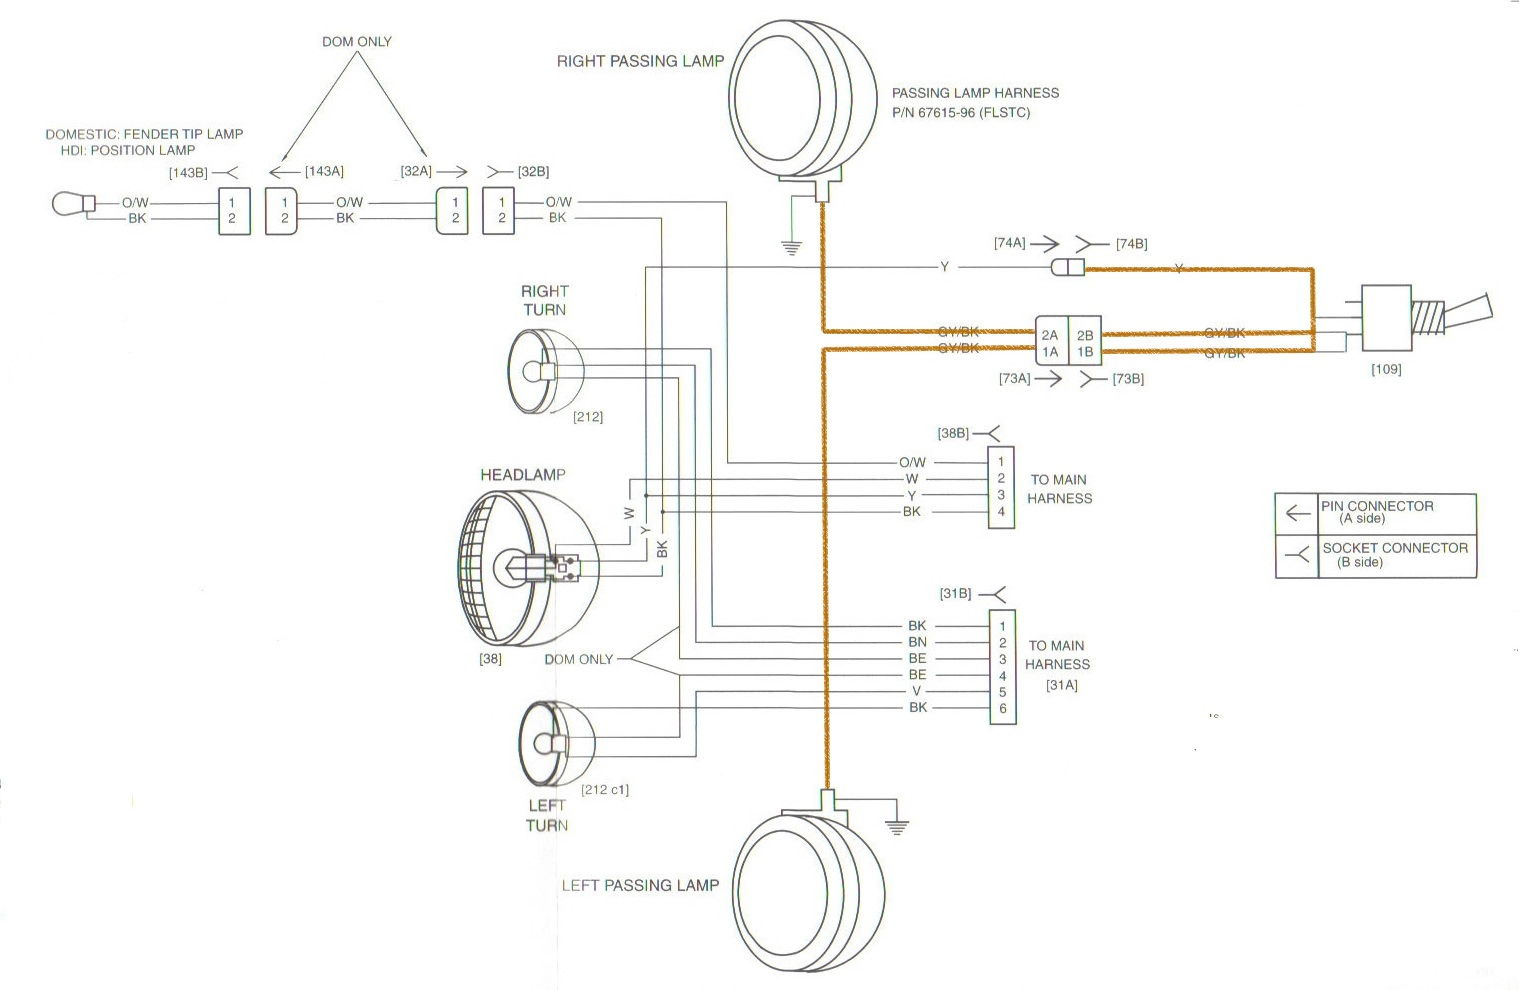 91 Flstc Wiring Diagram | Download Wiring Diagram on fld wiring diagram, classic wiring diagram, fxstd wiring diagram, flhtk wiring diagram, fxstc wiring diagram, vrscf wiring diagram, harley wiring diagram, fxstb wiring diagram, vrsc wiring diagram, rocker wiring diagram, xlch wiring diagram, flh wiring diagram, honda wiring diagram, flstf wiring diagram, wl wiring diagram, flhtcu wiring diagram, softail wiring diagram, dyna wiring diagram, kawasaki wiring diagram, ultra wiring diagram,